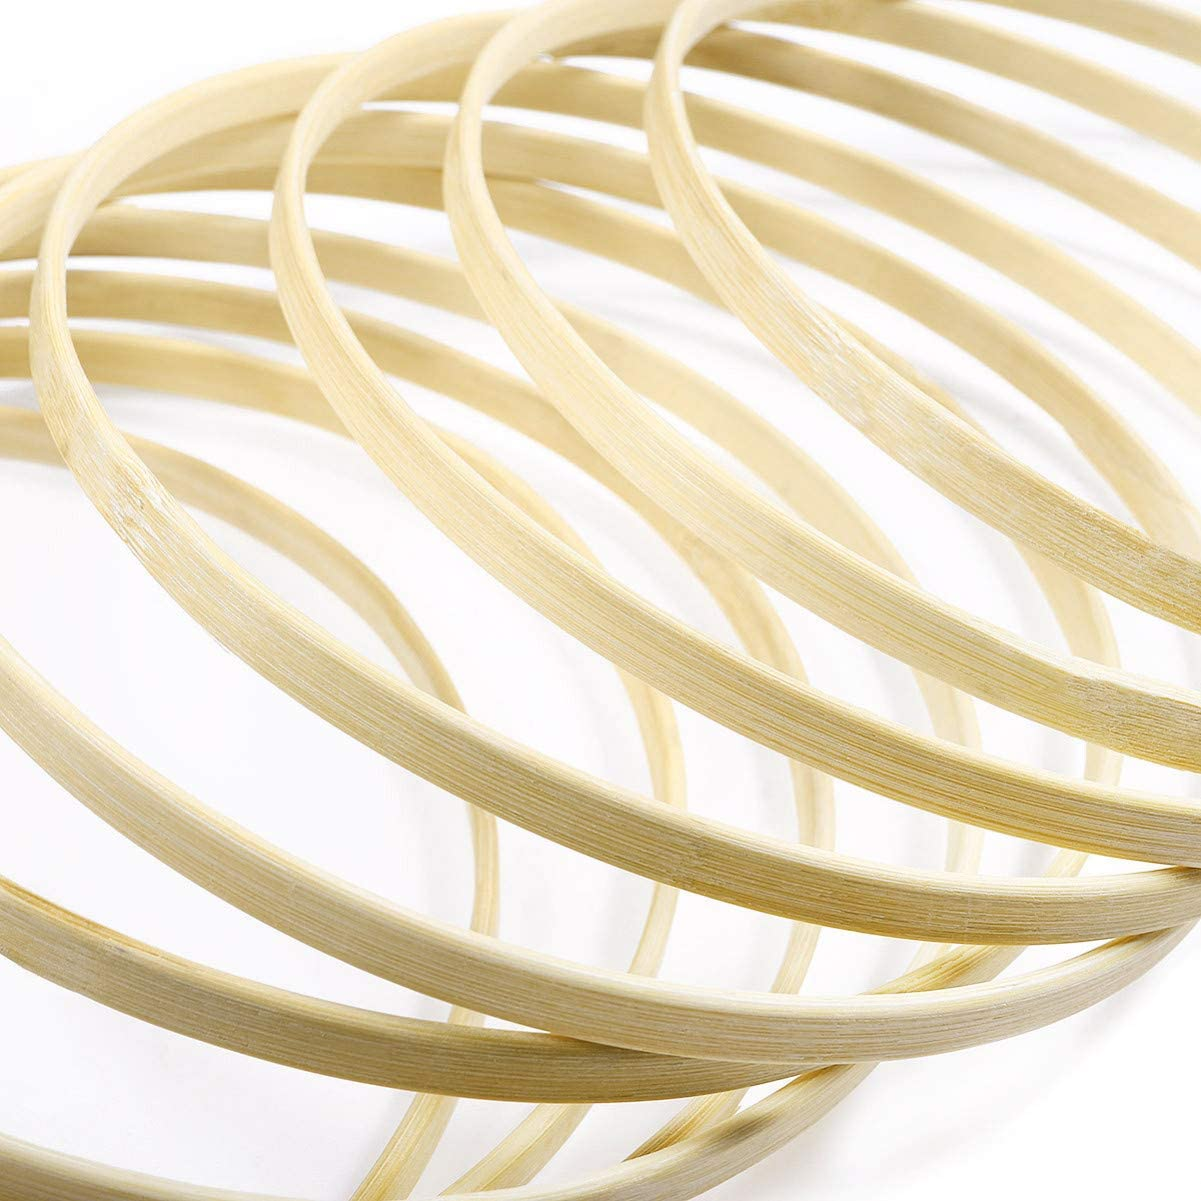 13x Traumfänger Dreamcatcher Bambus Drahtring Ø 10-26cm DIY Runde Holz Hoop